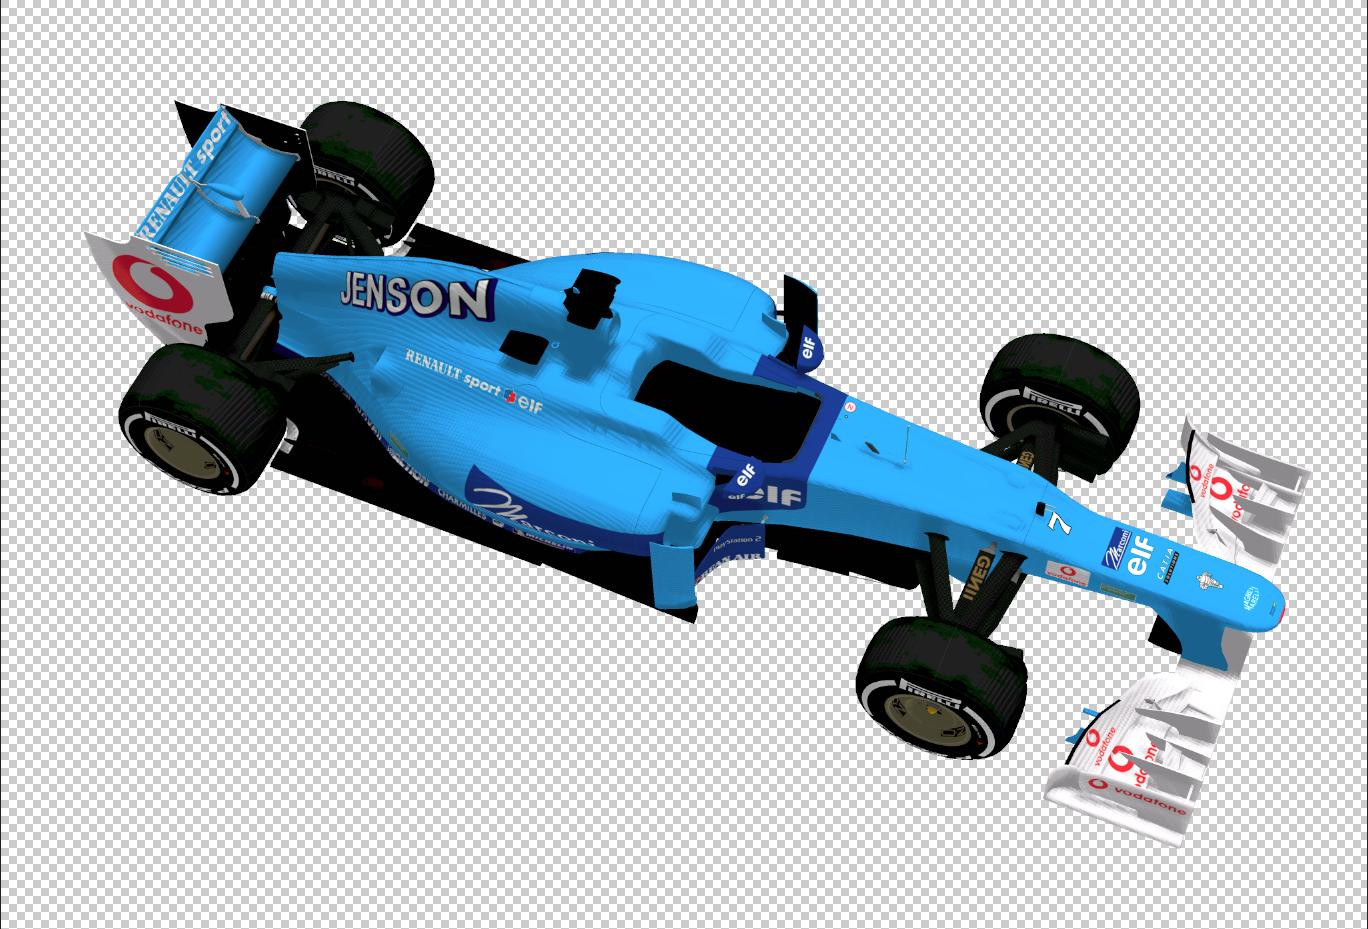 2001 Benetton Non-Tobacco (#8 JENSON).PNG